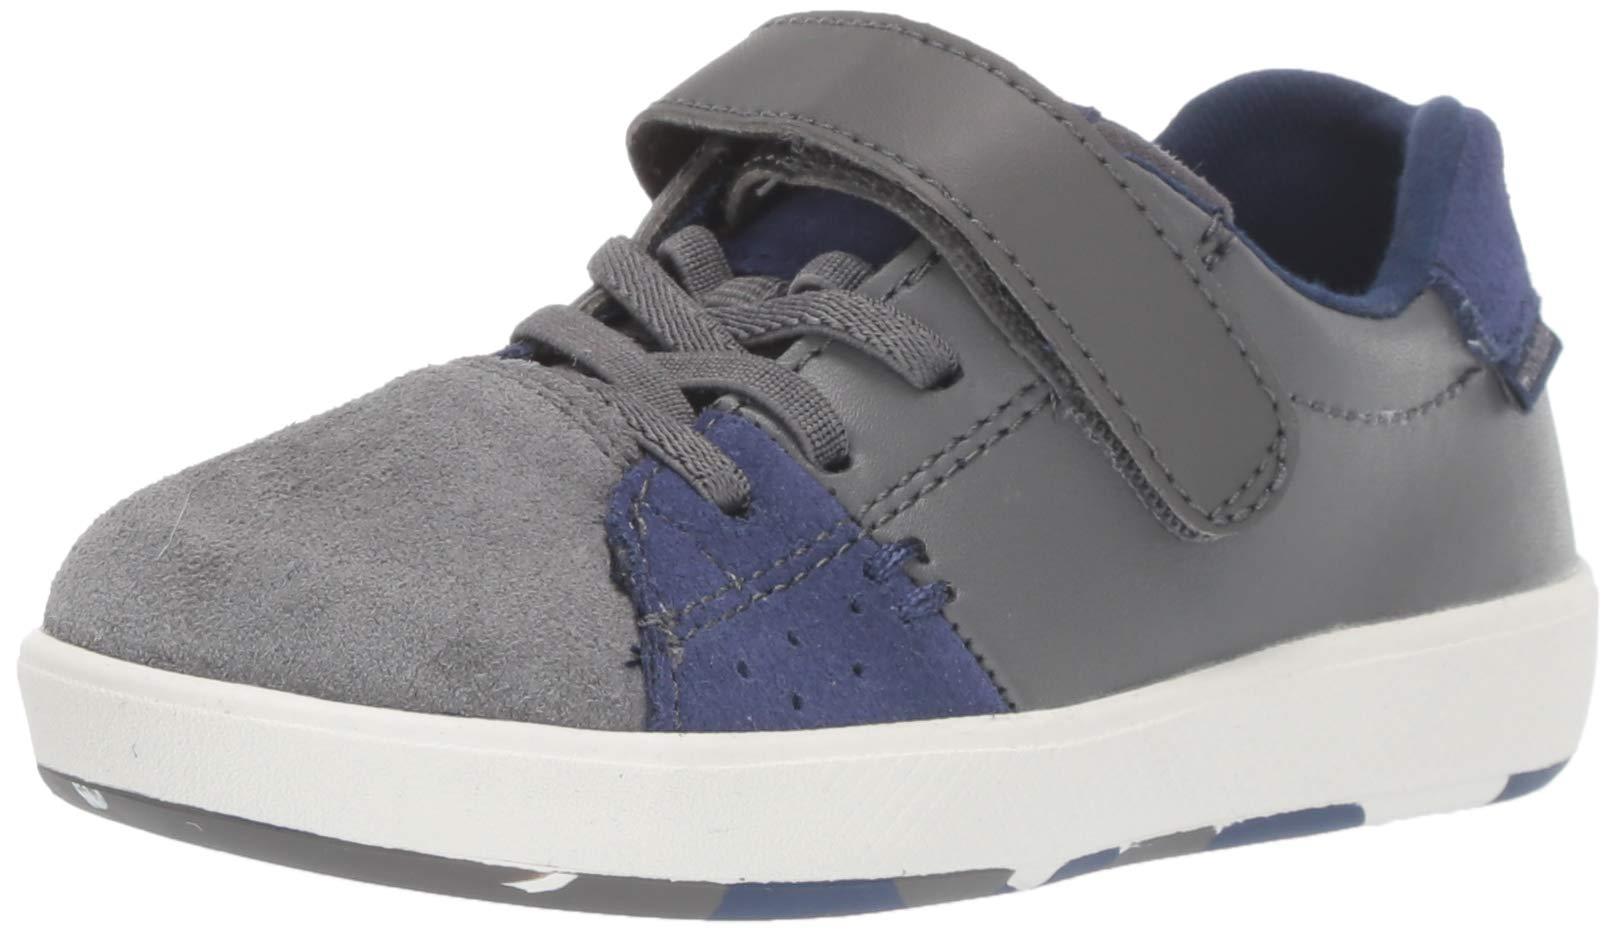 Stride Rite Boys' M2P Maci Sneaker, Grey/Navy, 6 W US Toddler by Stride Rite